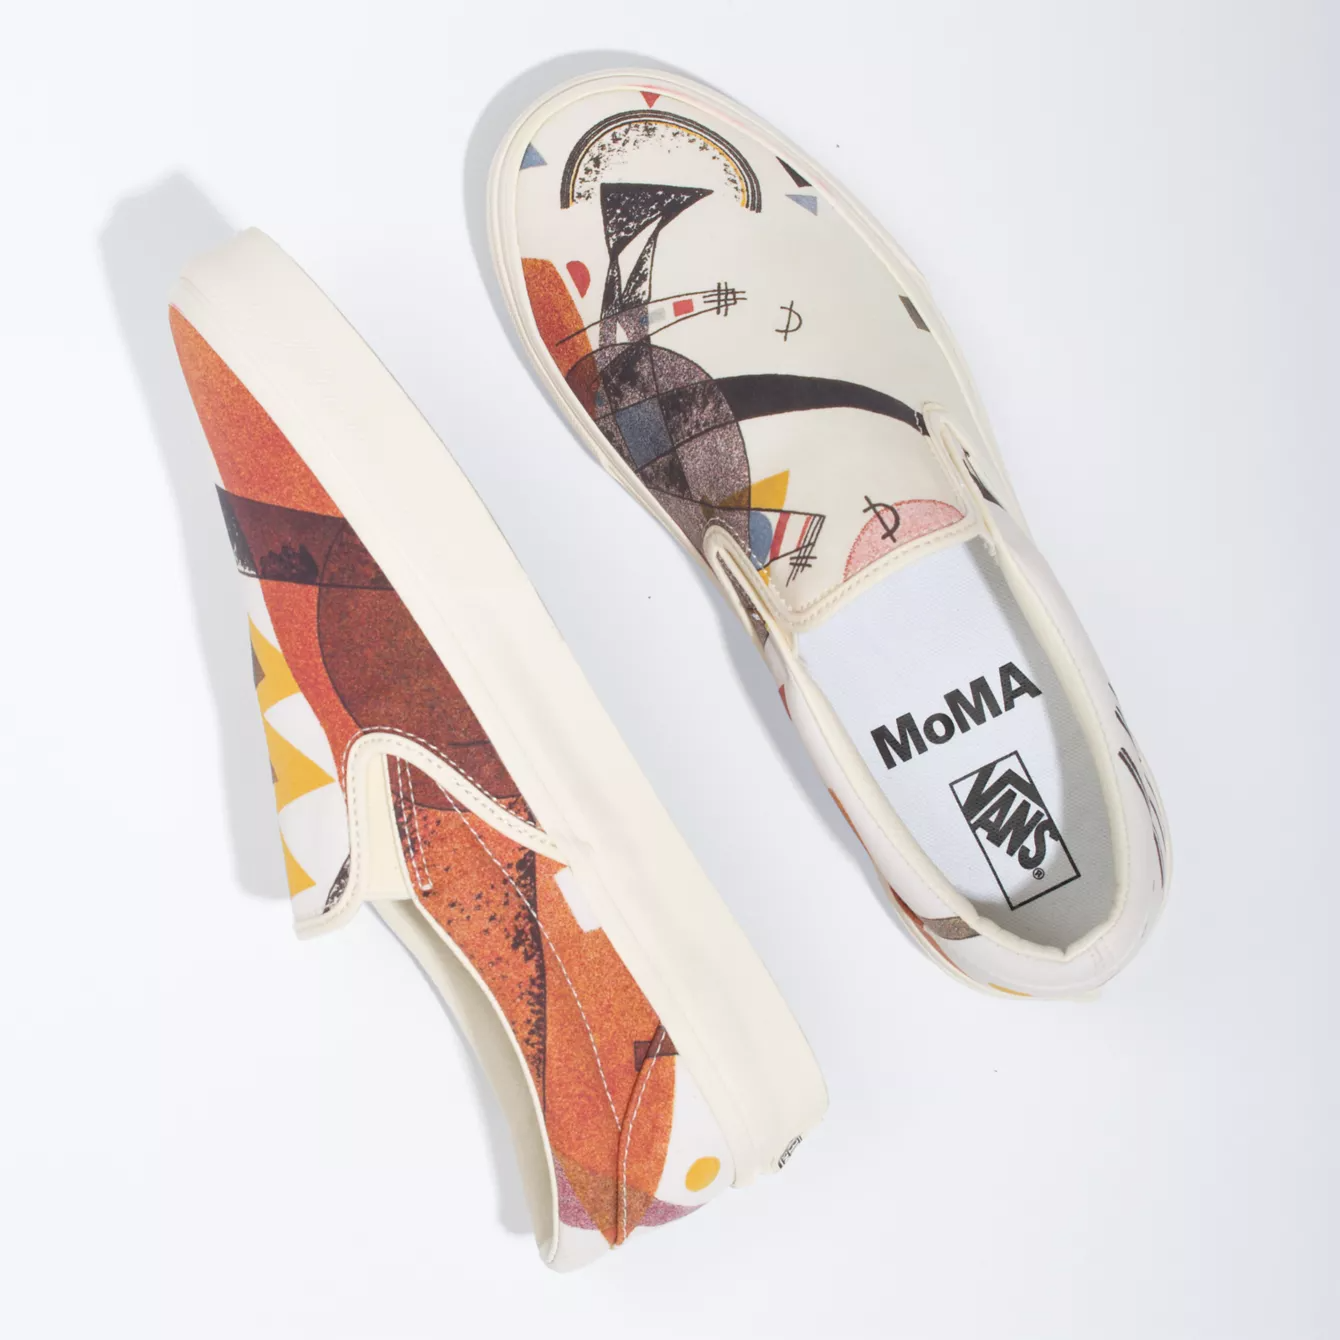 Zapatillas Vans MoMA Vasily Kandinsky Classic Slip-On